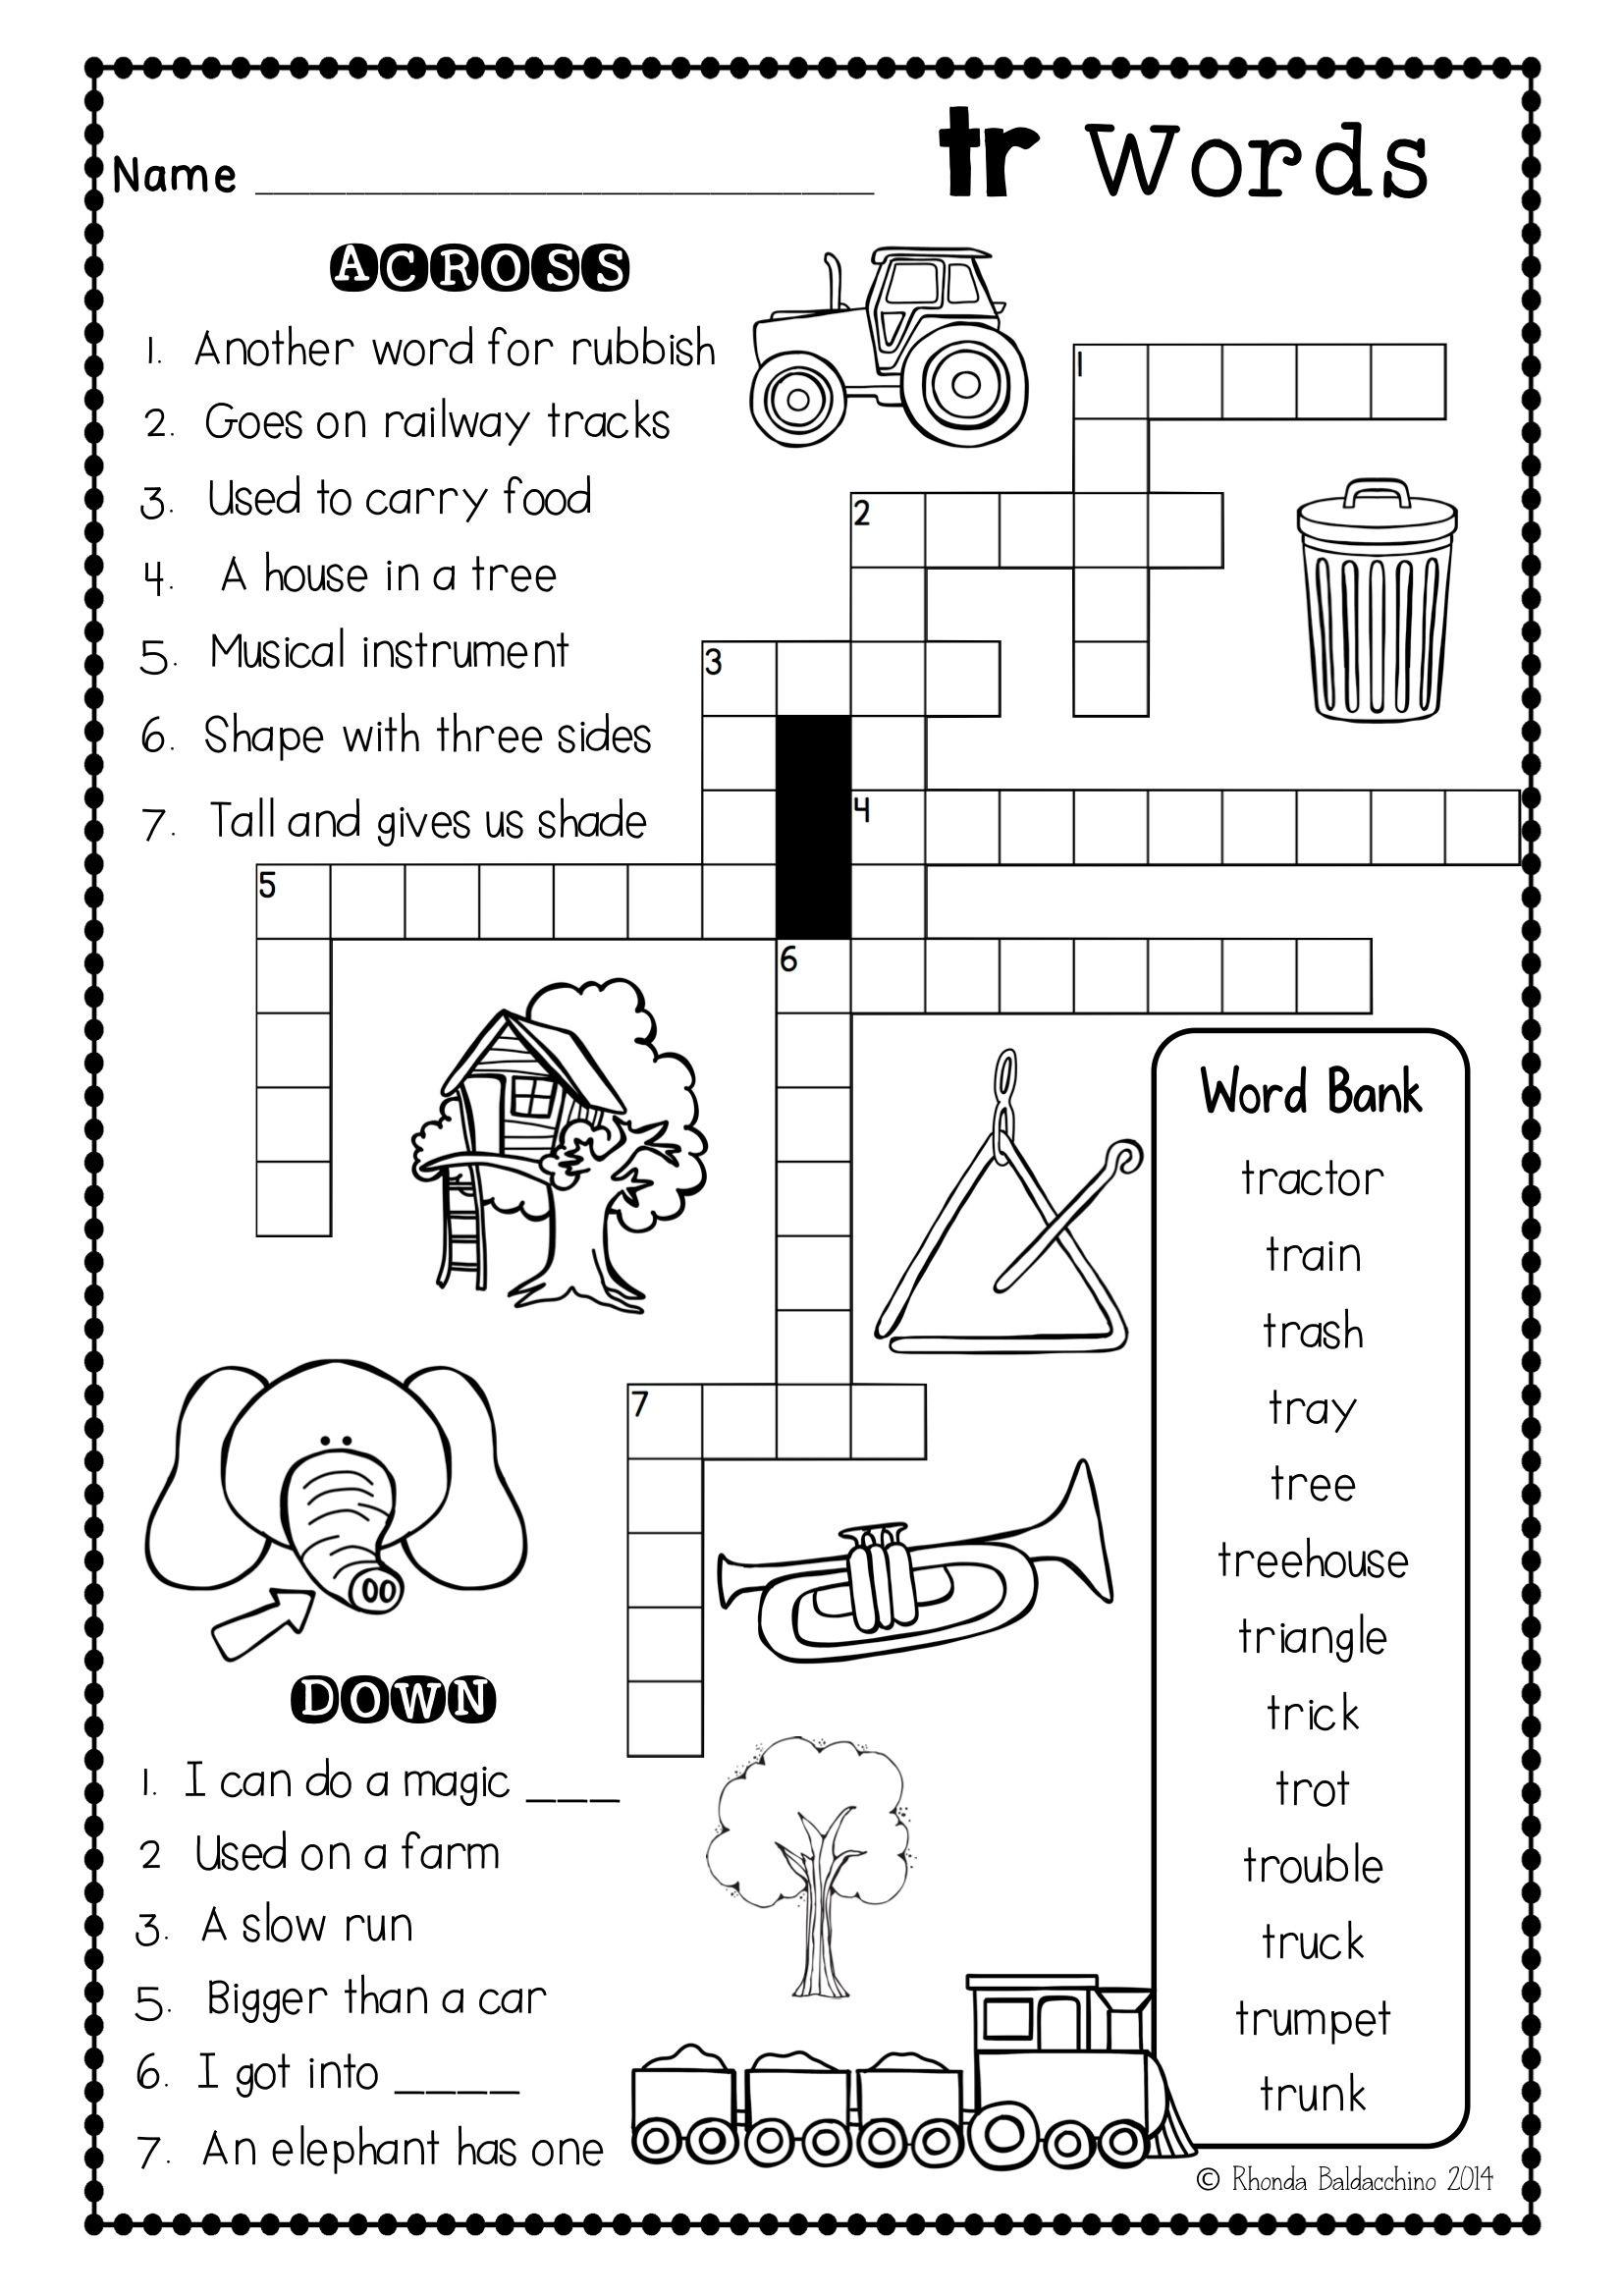 Crossword Fun Blends